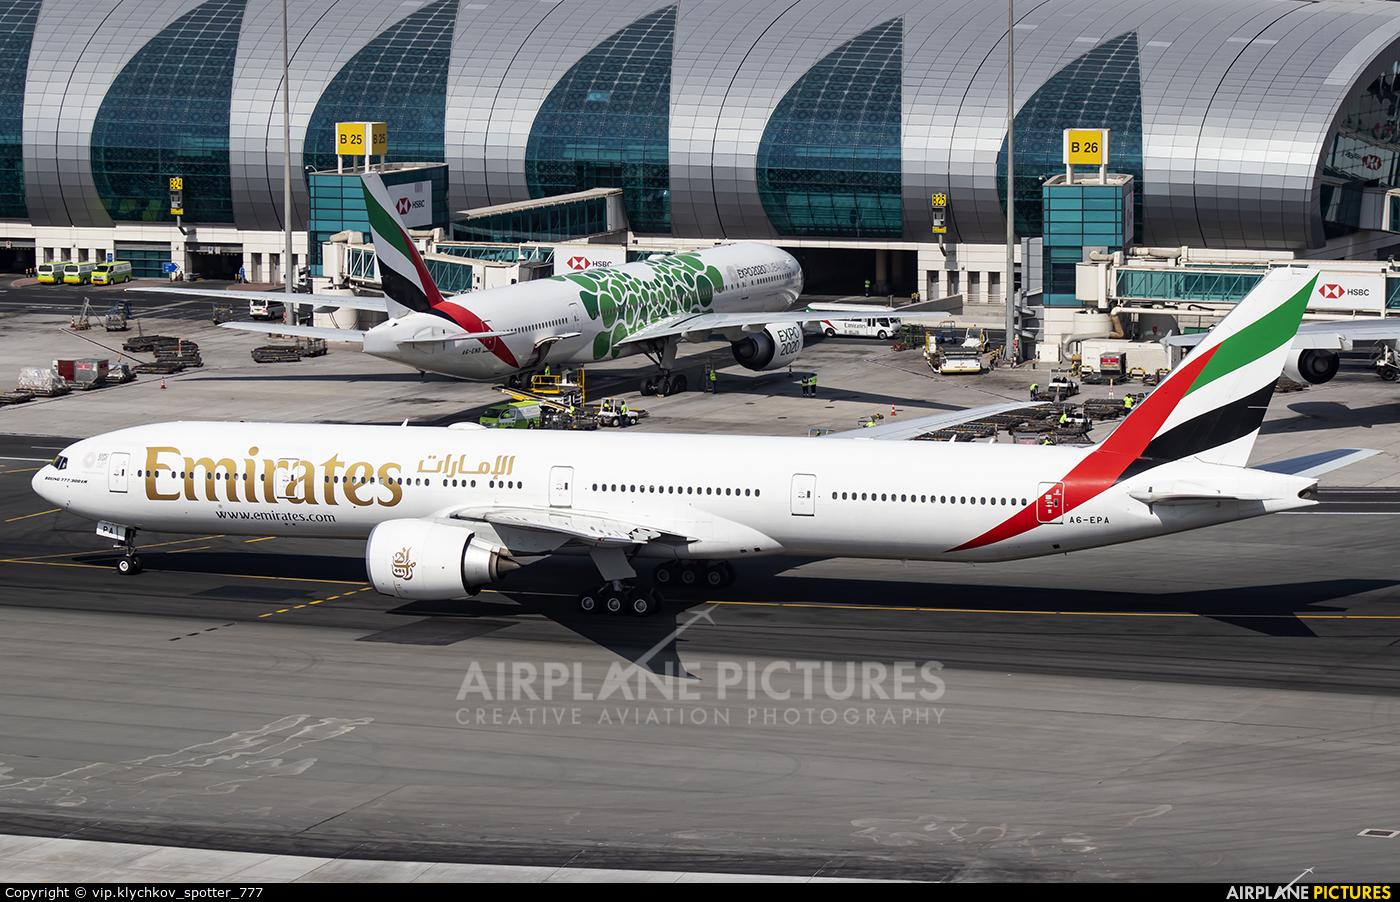 Emirates Airlines A6-EPA aircraft at Dubai Intl